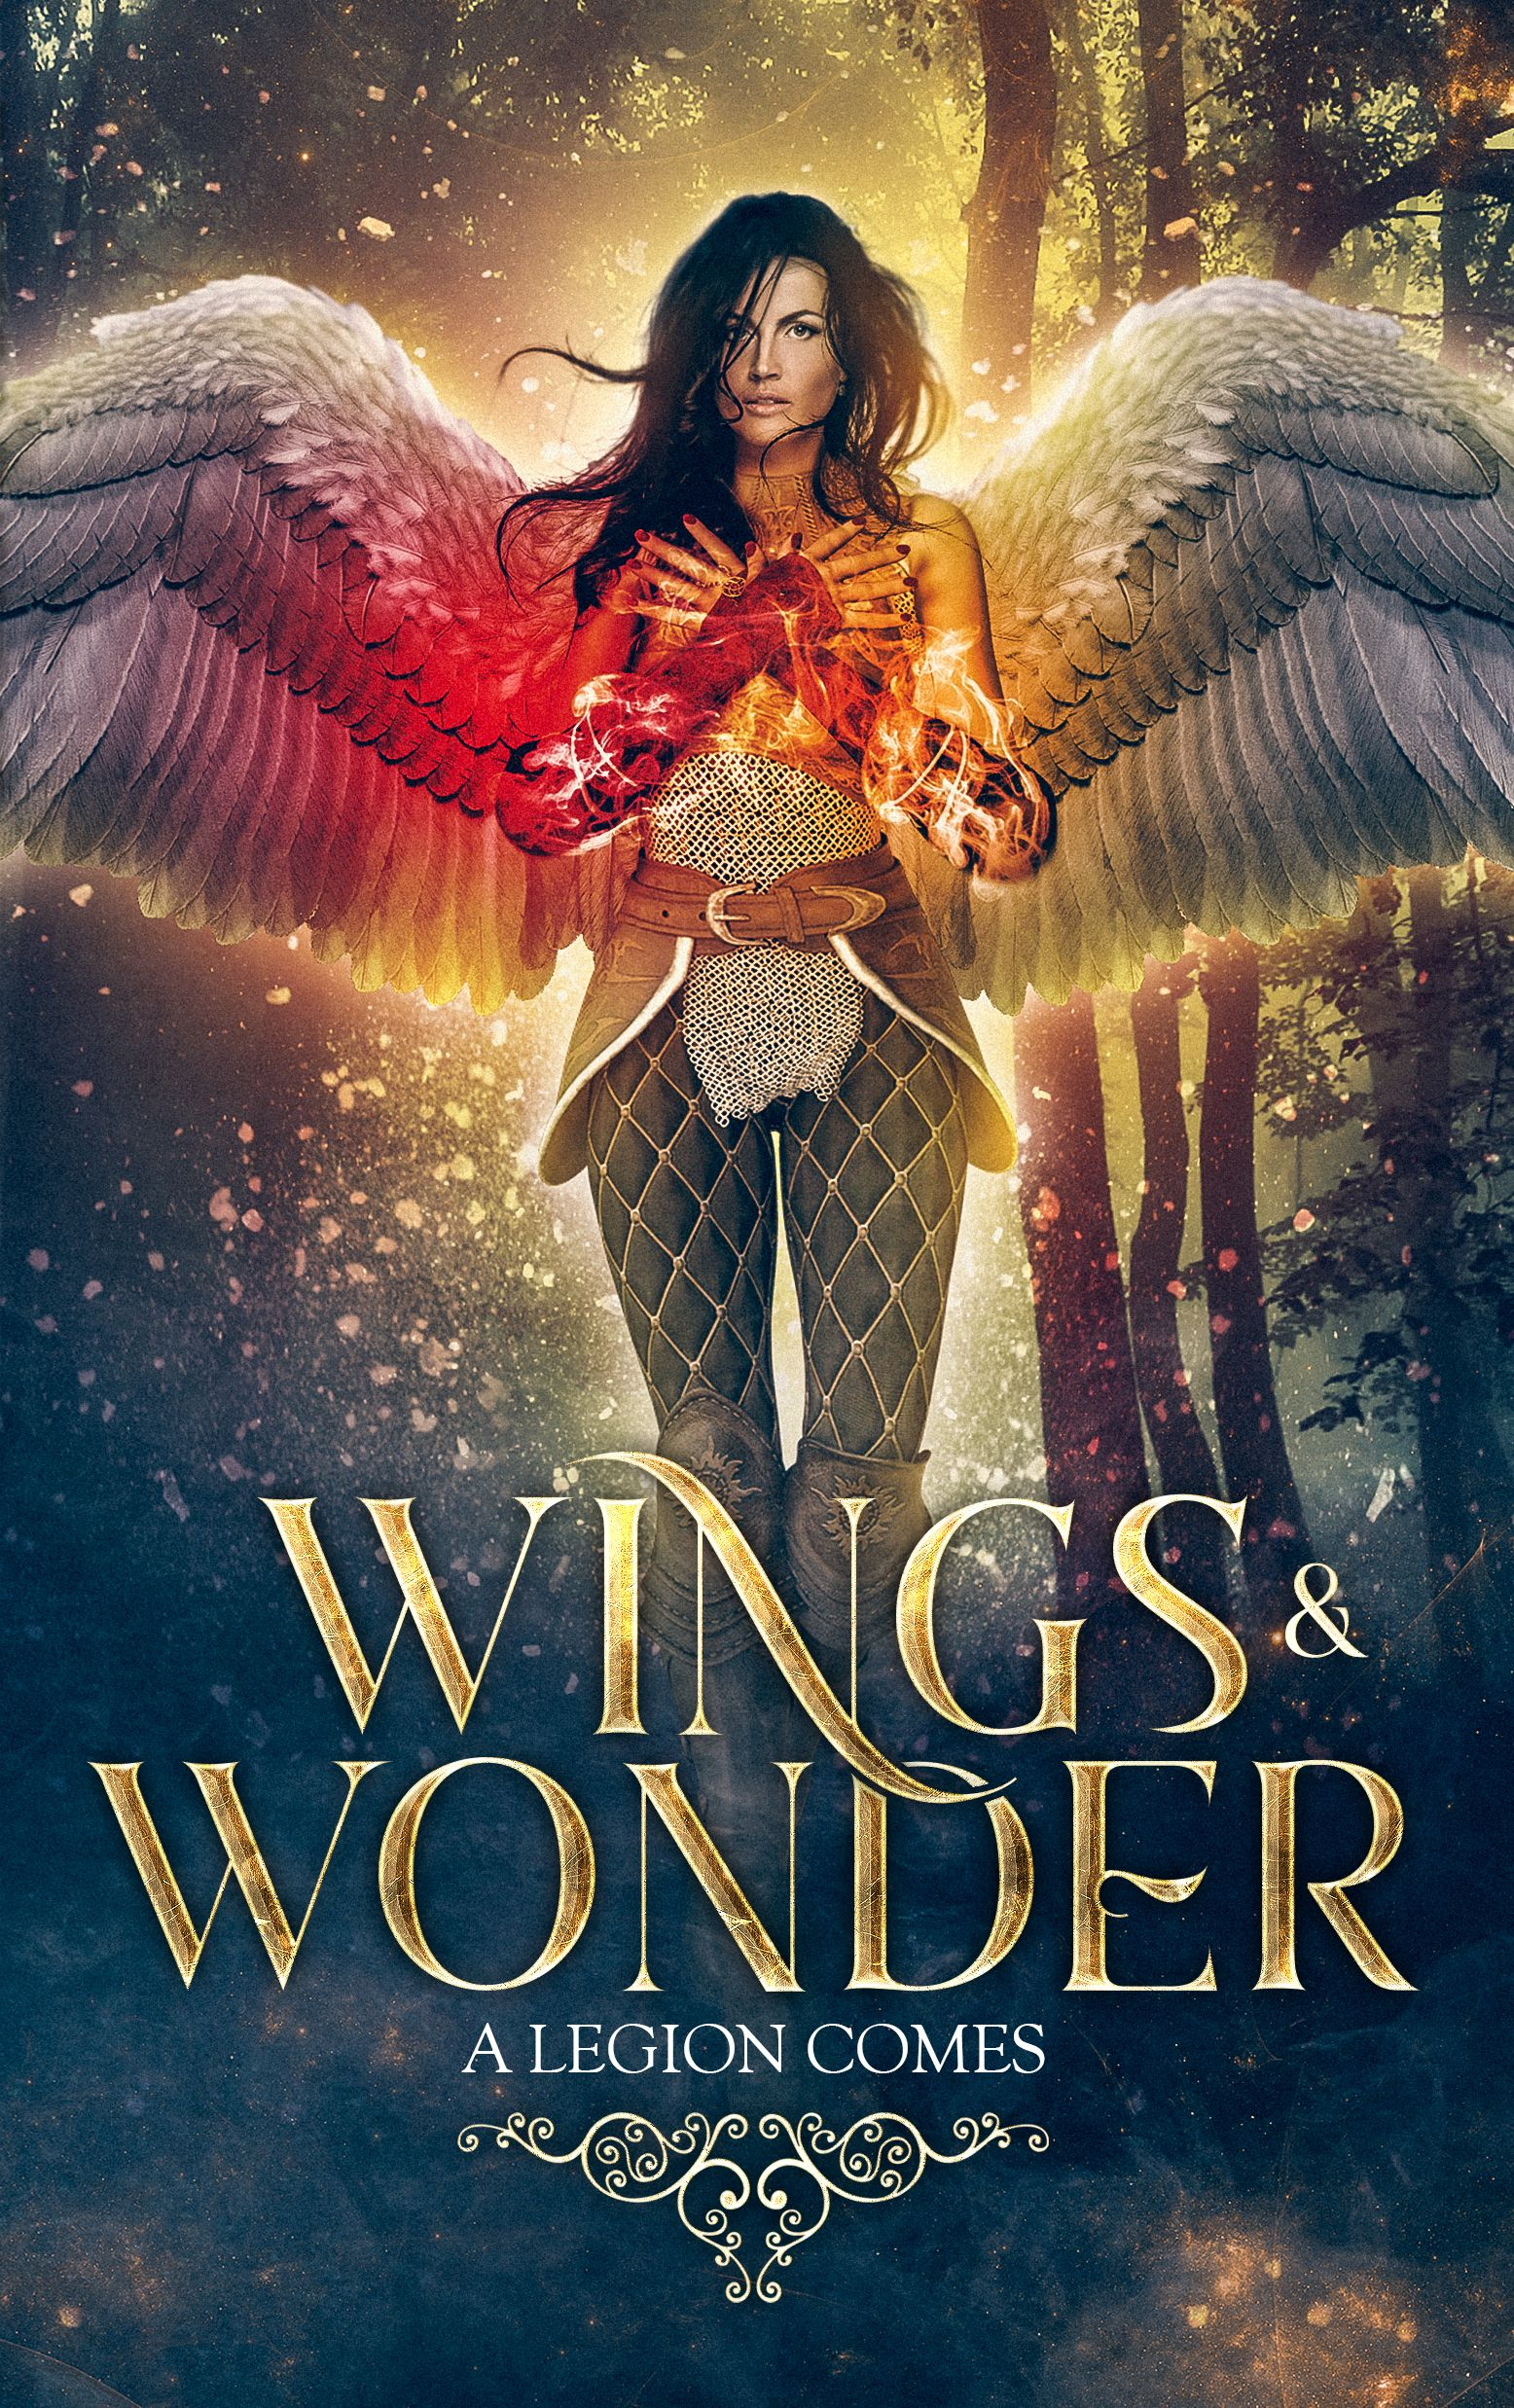 New Fantasy Warrior Angel Book Cover Design Happy Weekend Miblart Bookcoverdesign Selfpublishing Books Des Angel Books Wattpad Book Covers Fantasy Books